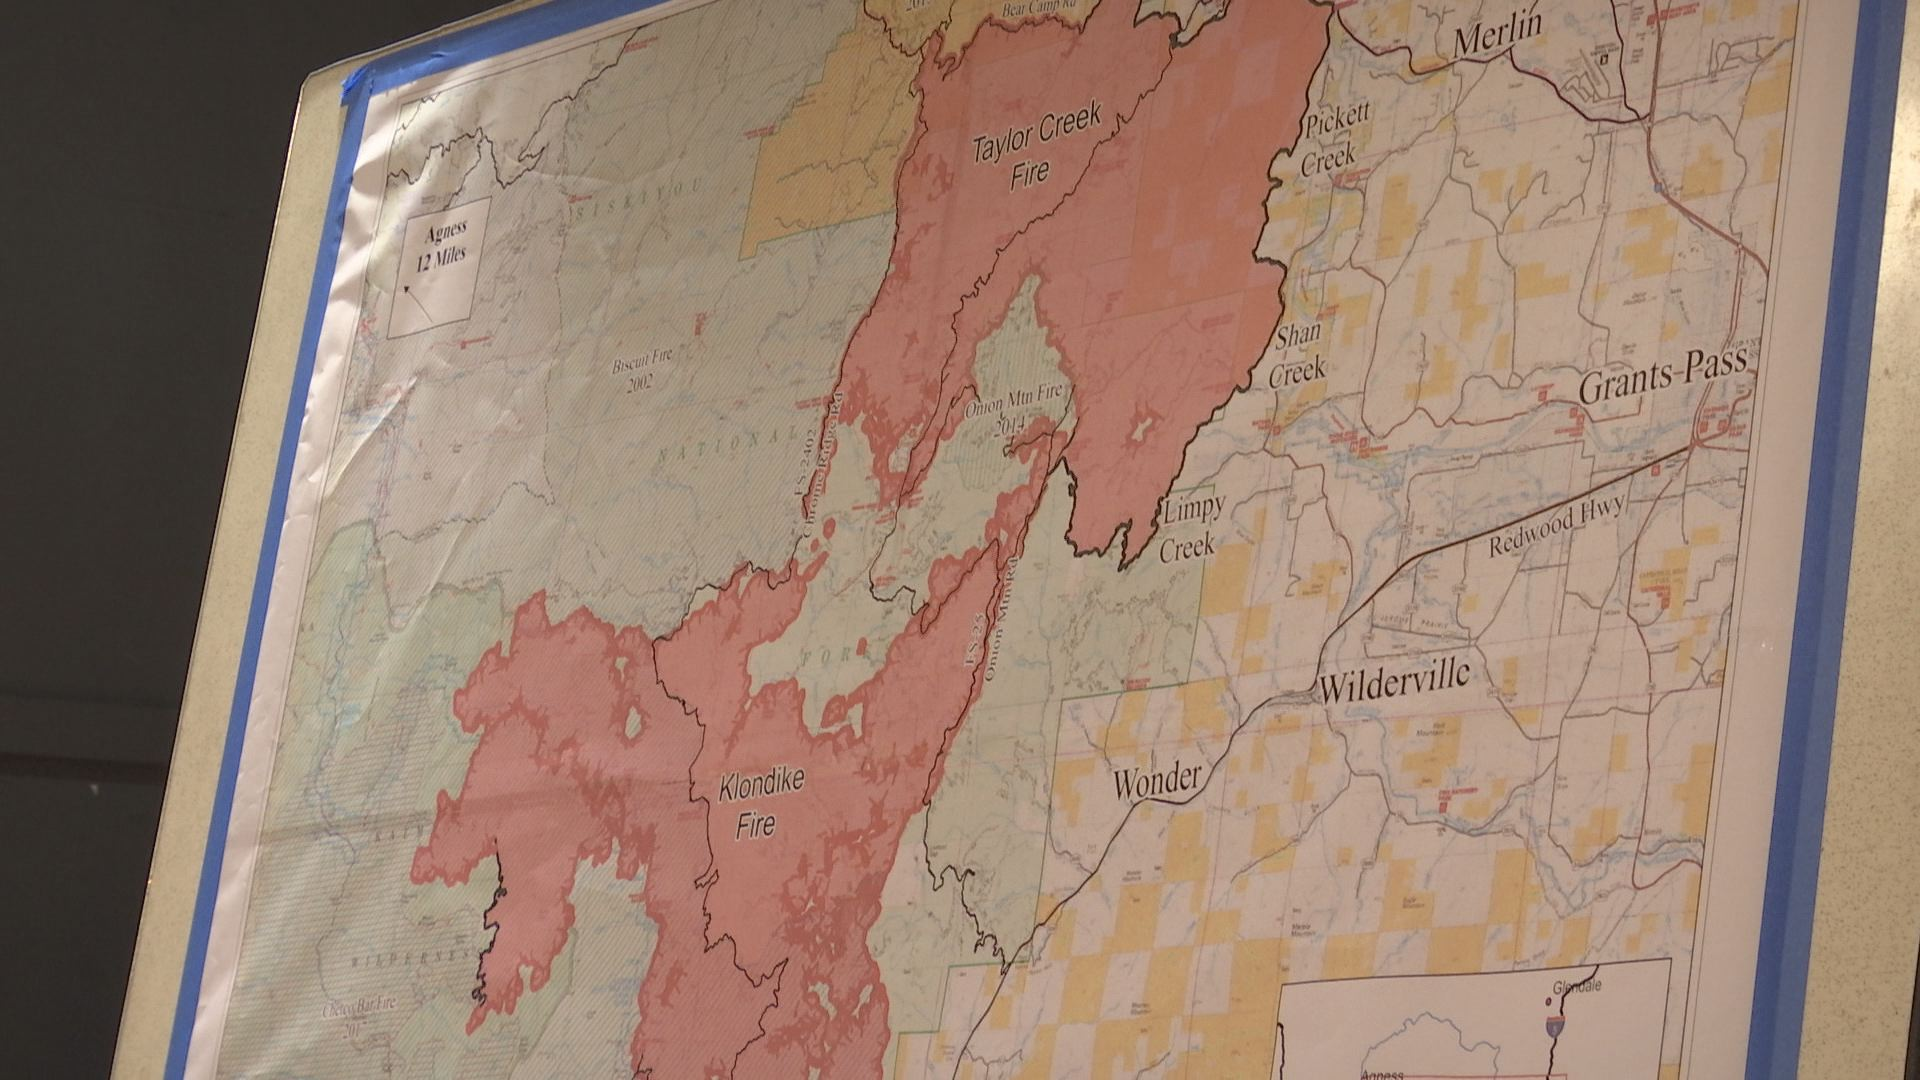 New Command For Klondike And Taylor Creek Fires Kobi Tv Nbc5